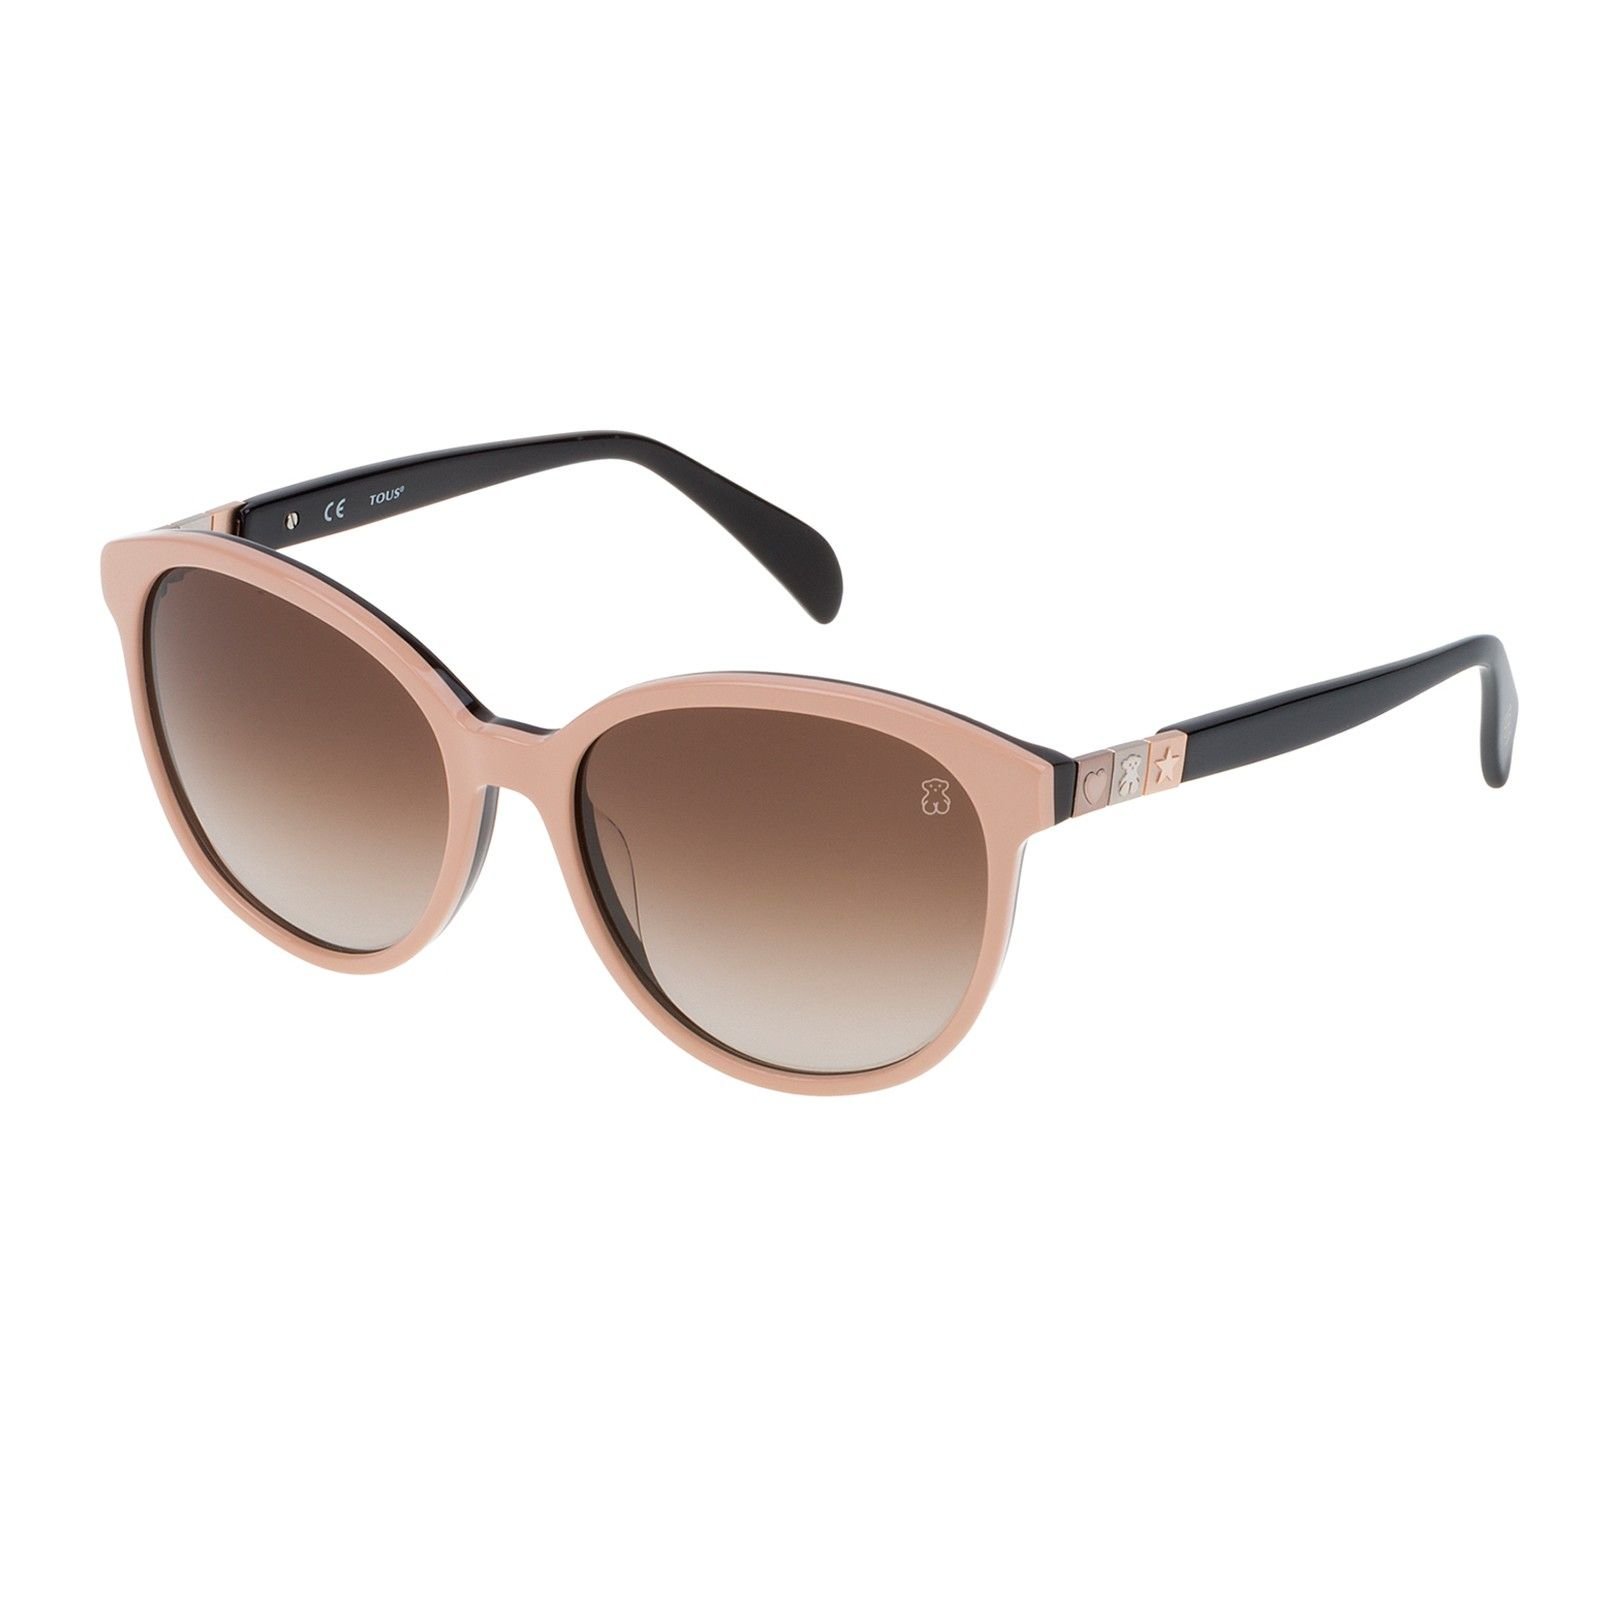 28add28ec4 Gafas de sol Tille Cat Eye | Orgazam | Sunglasses, Glasses, Fashion